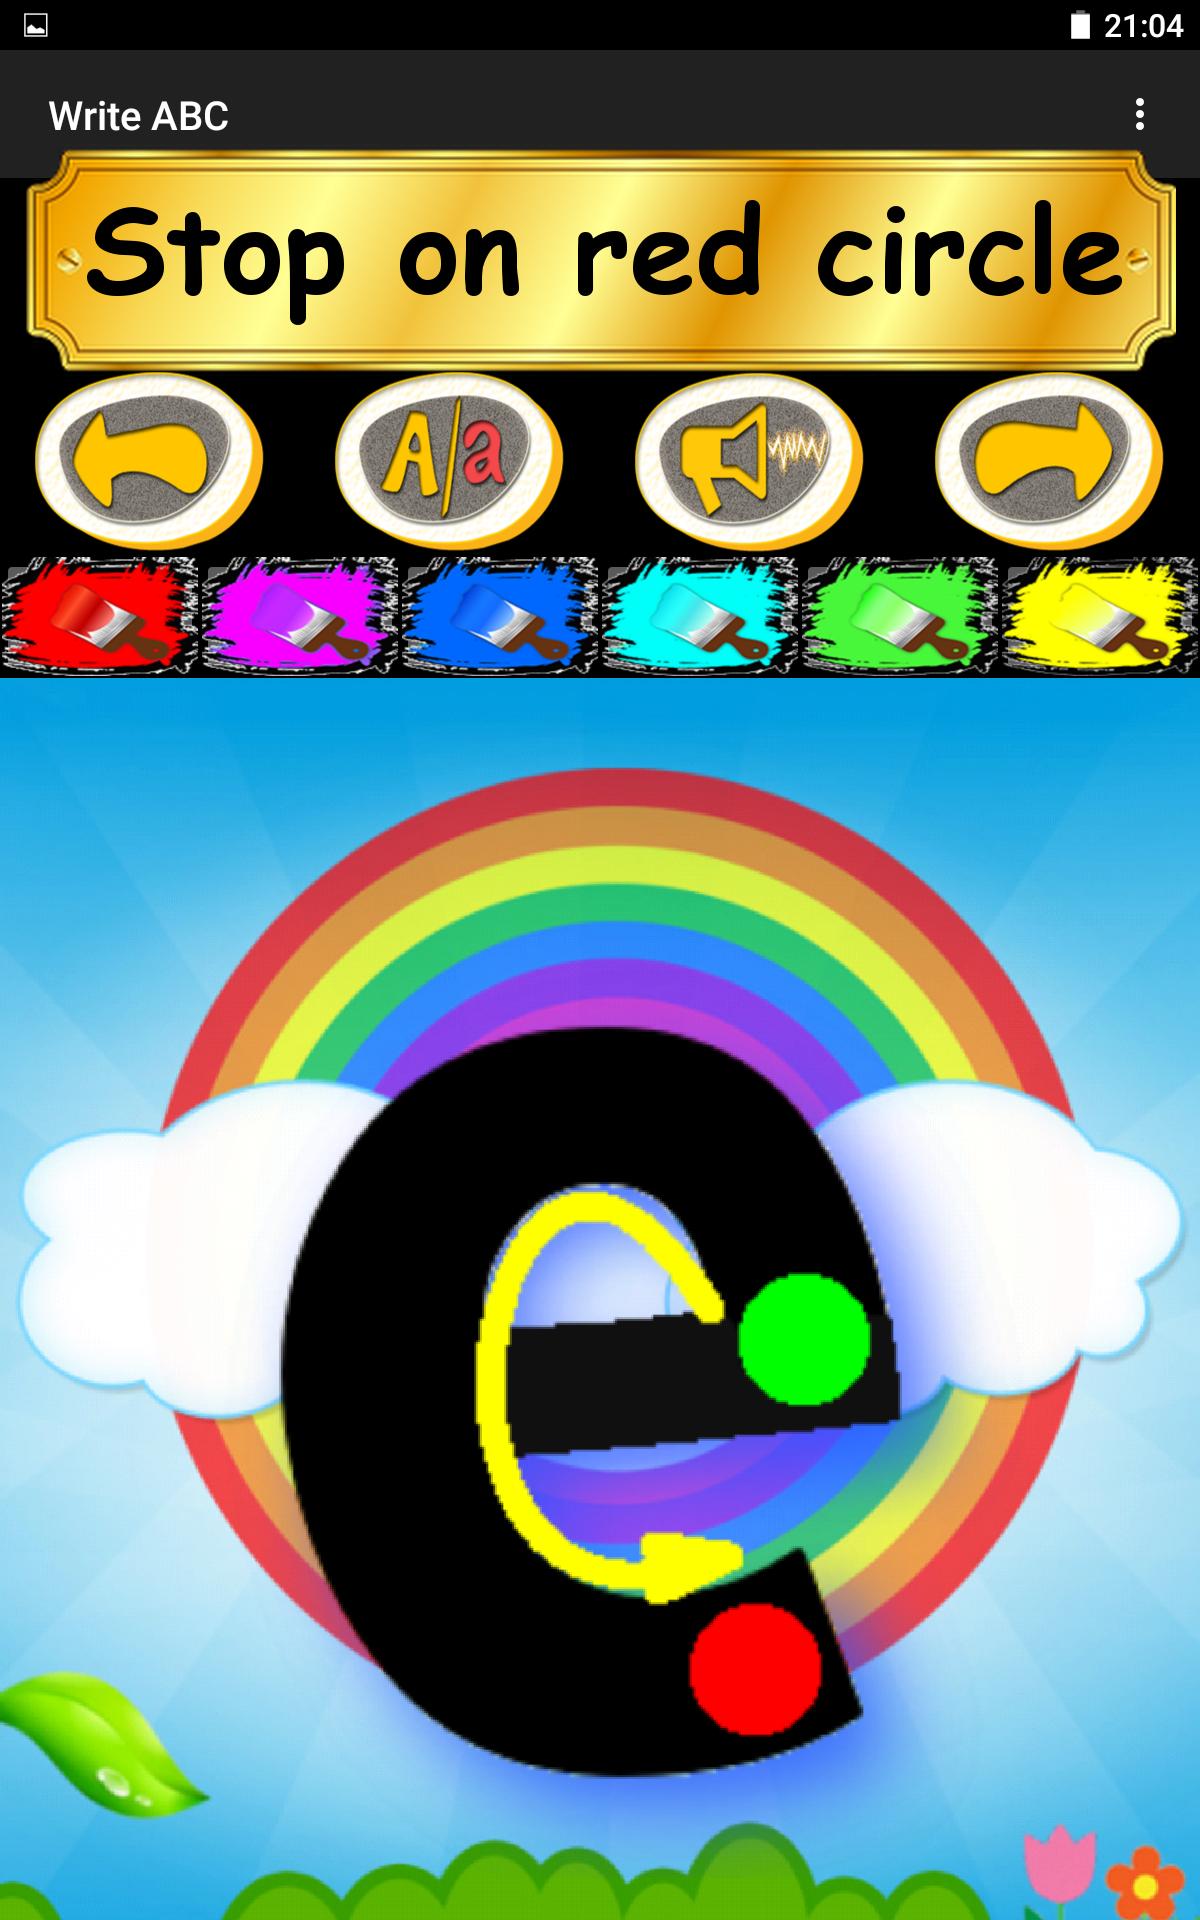 Write ABC - Learn Alphabets screenshot #22